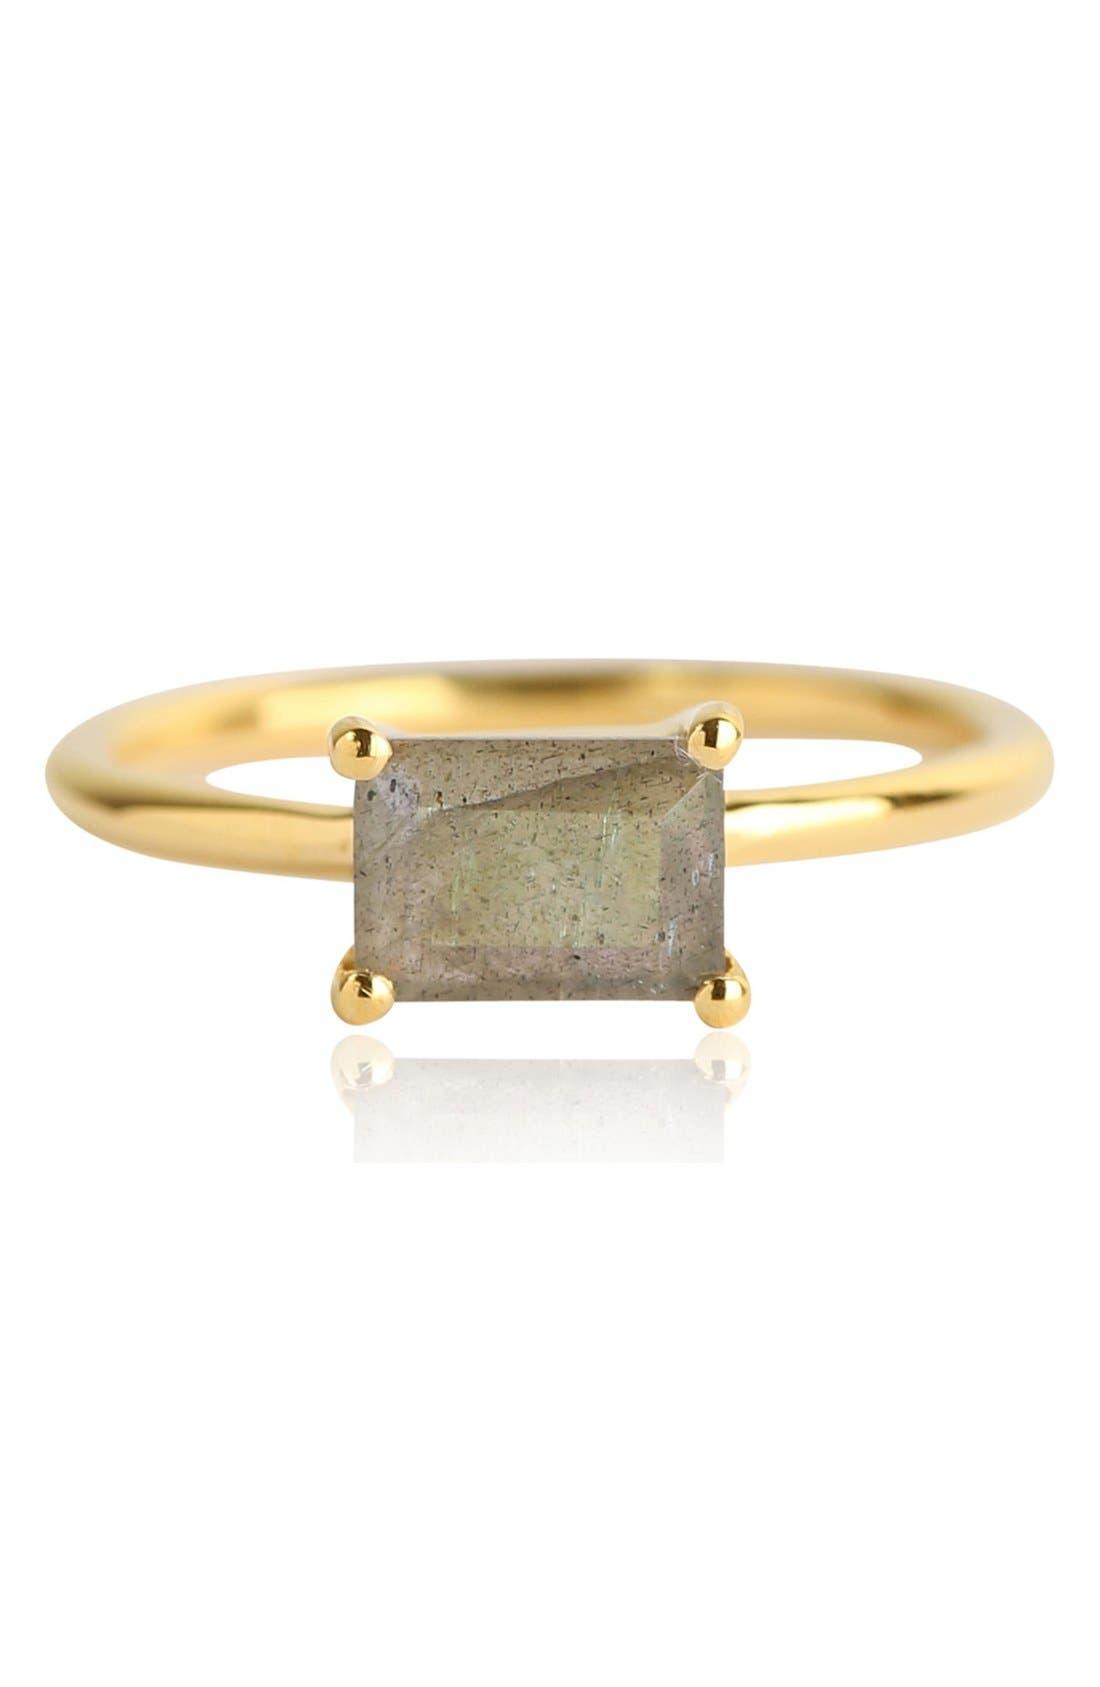 Baguette Stone Ring,                             Main thumbnail 1, color,                             020